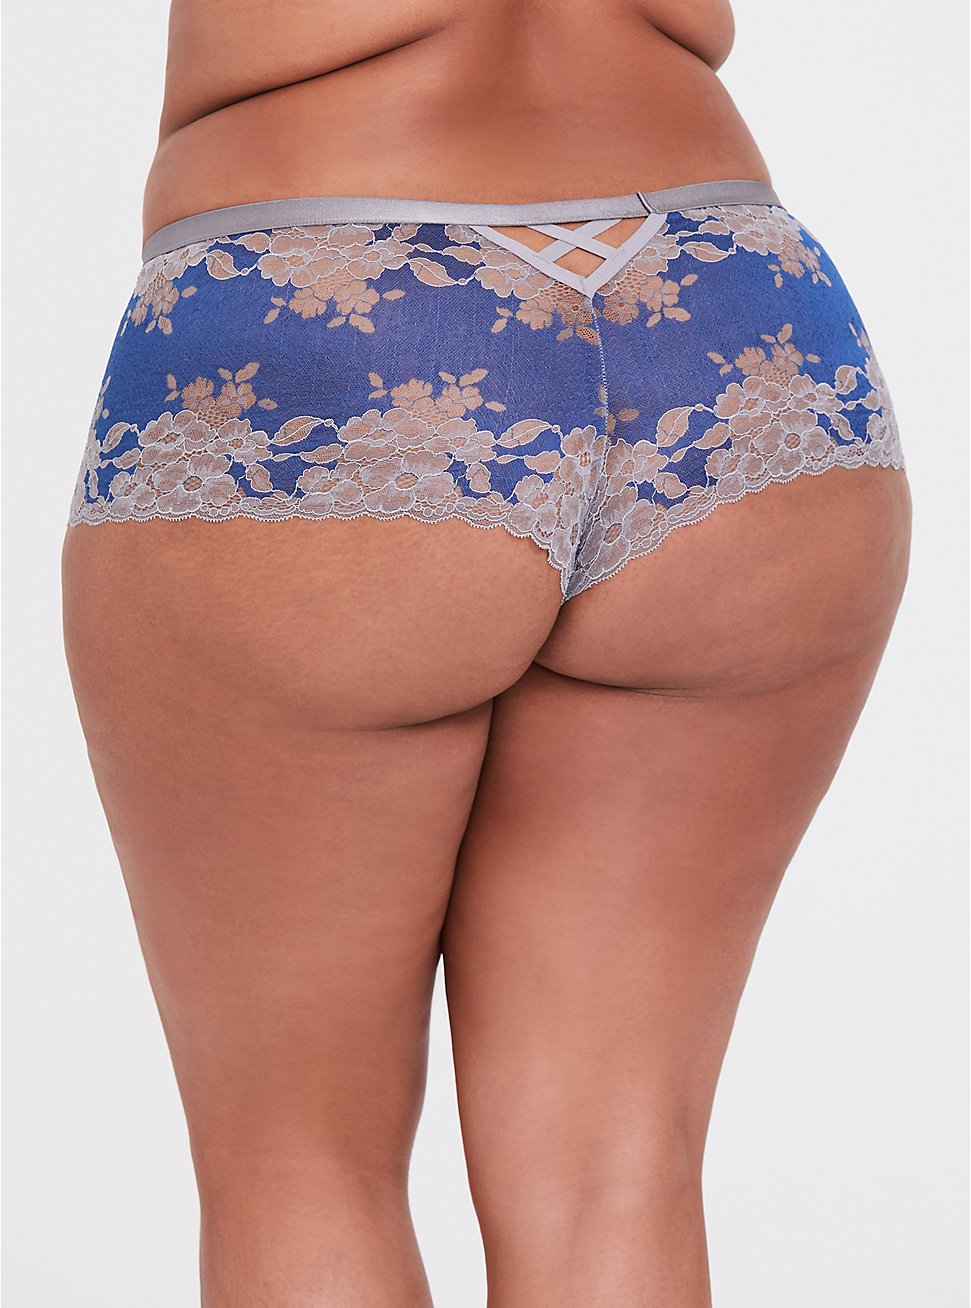 Sapphire Blue & Grey Lattice Back Lace Cheeky Panty, LIMOGES BLUE, hi-res